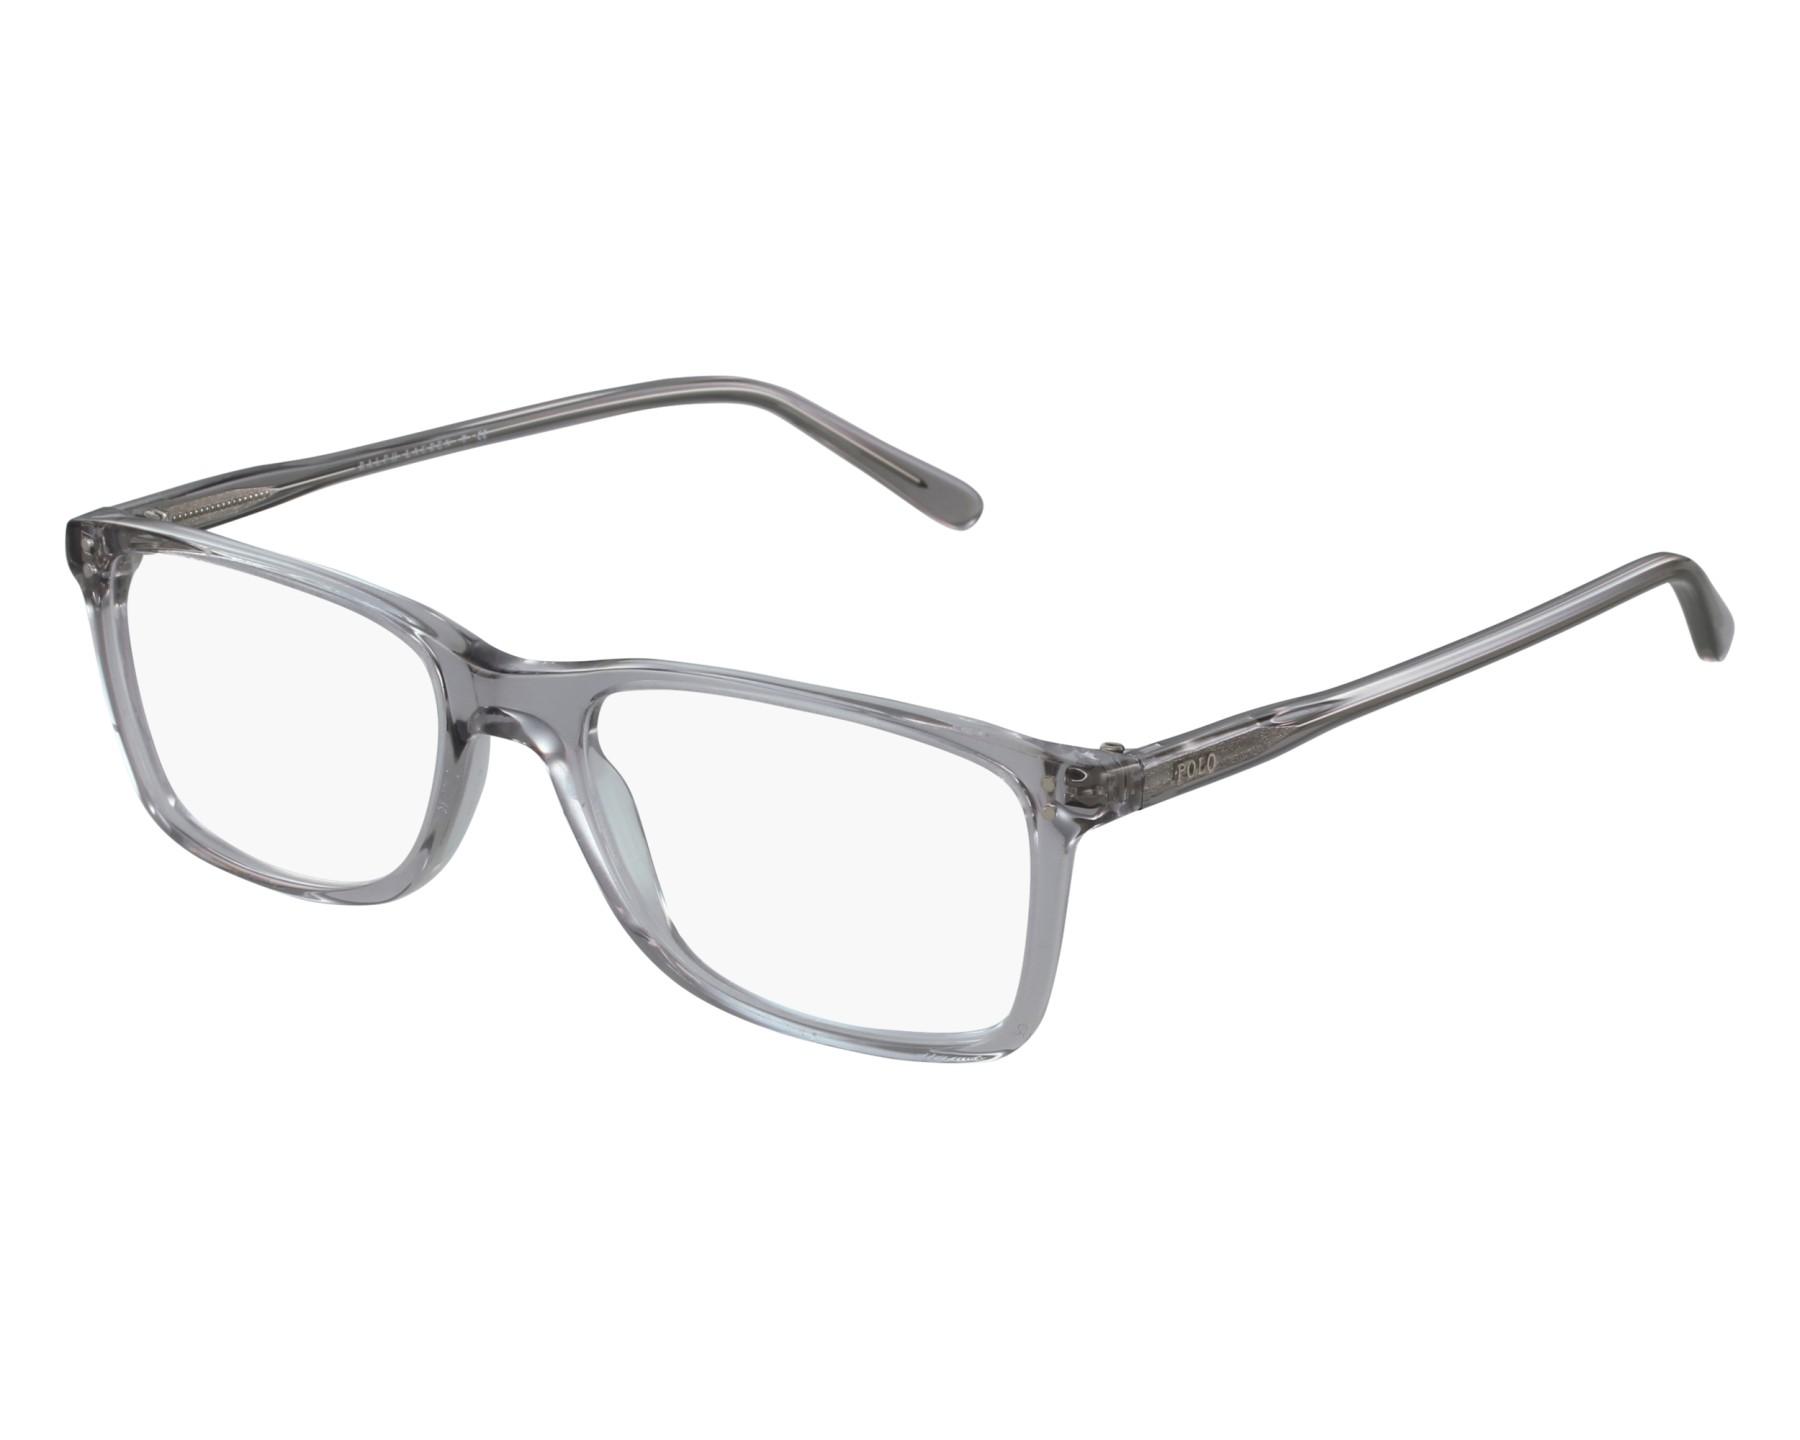 3d72e10bf29c eyeglasses Ralph Lauren PH-2155 5413 - Grey front view